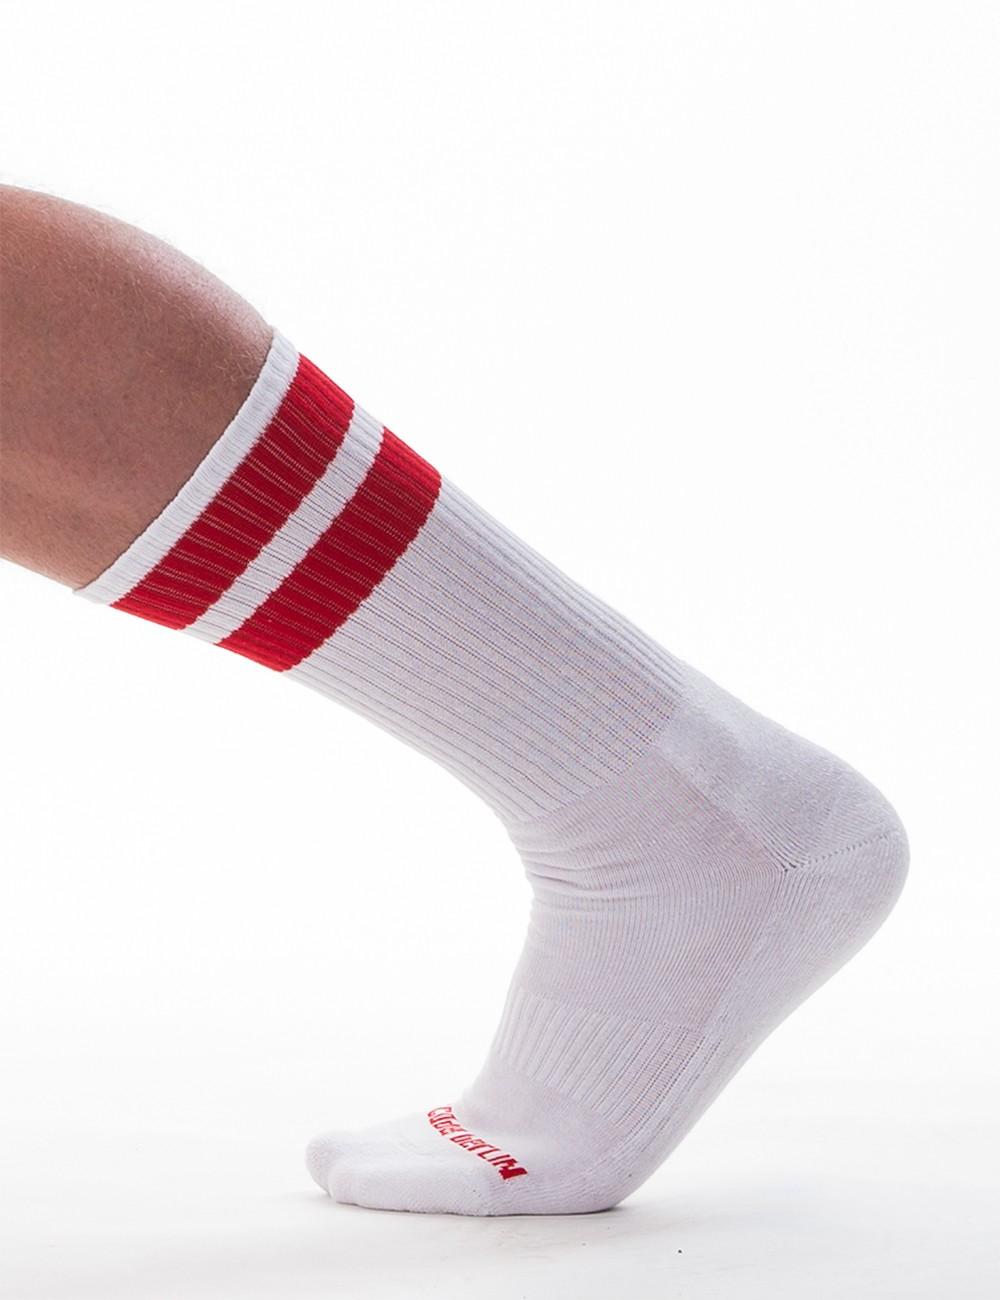 Gym Socks - White-Red